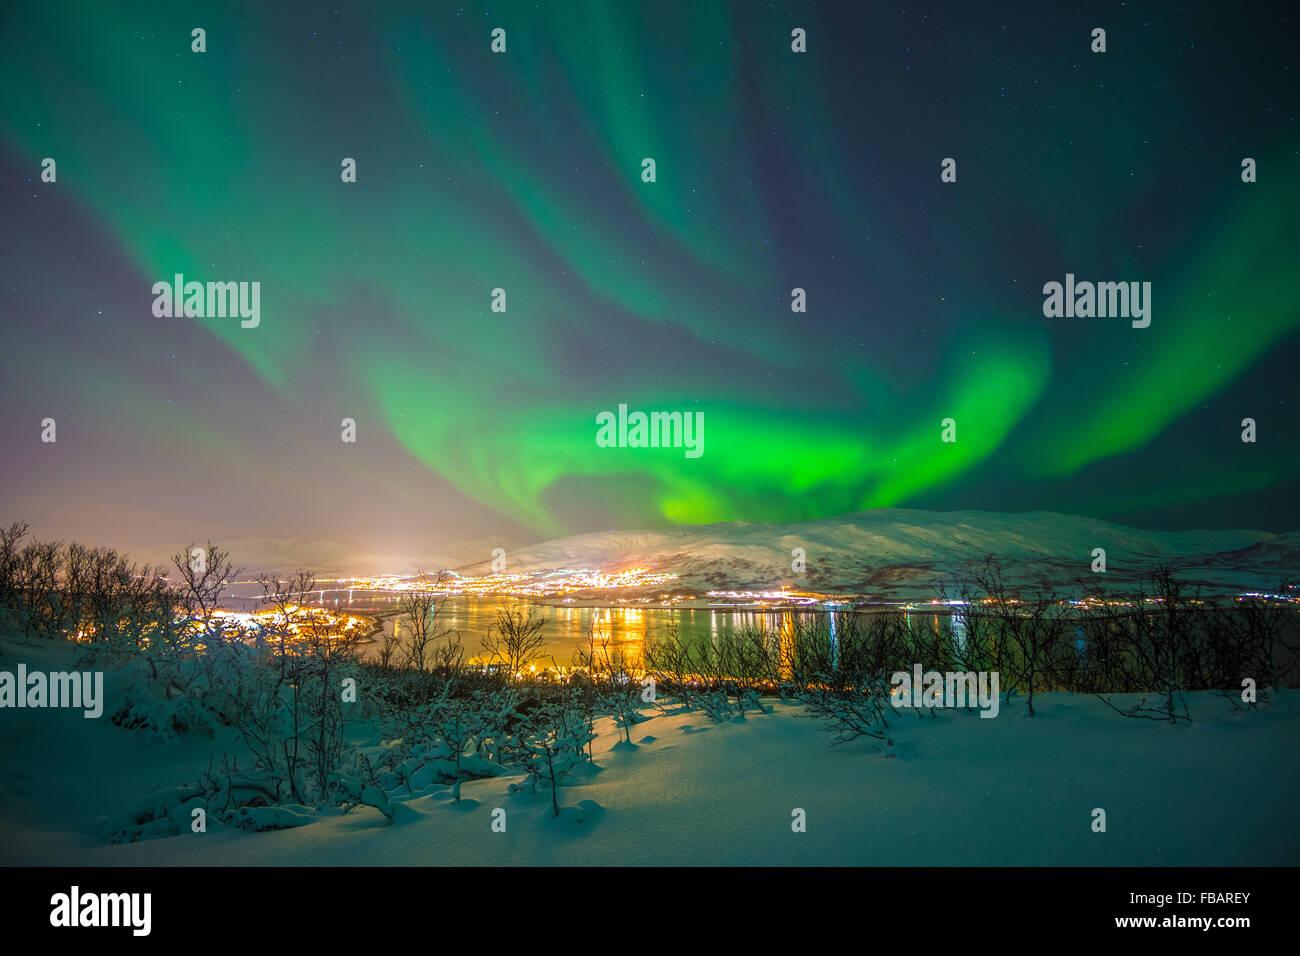 Aurora Borealis over Tromso, Northern Norway - Stock Image